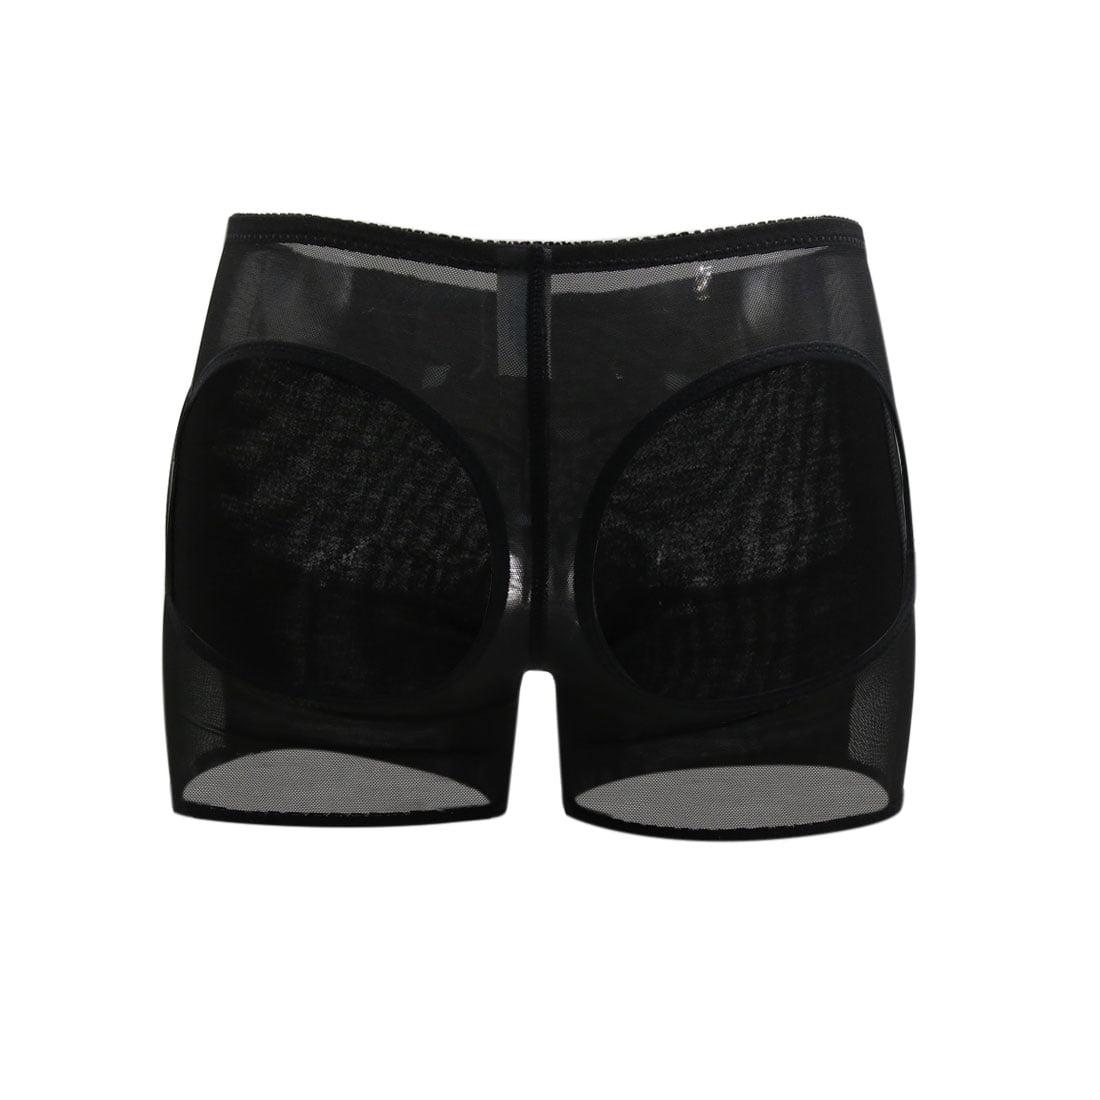 31f8b4ab719 M Women Hip Lifter Body Shaper Panty Shapewear Belly Control Pants Black